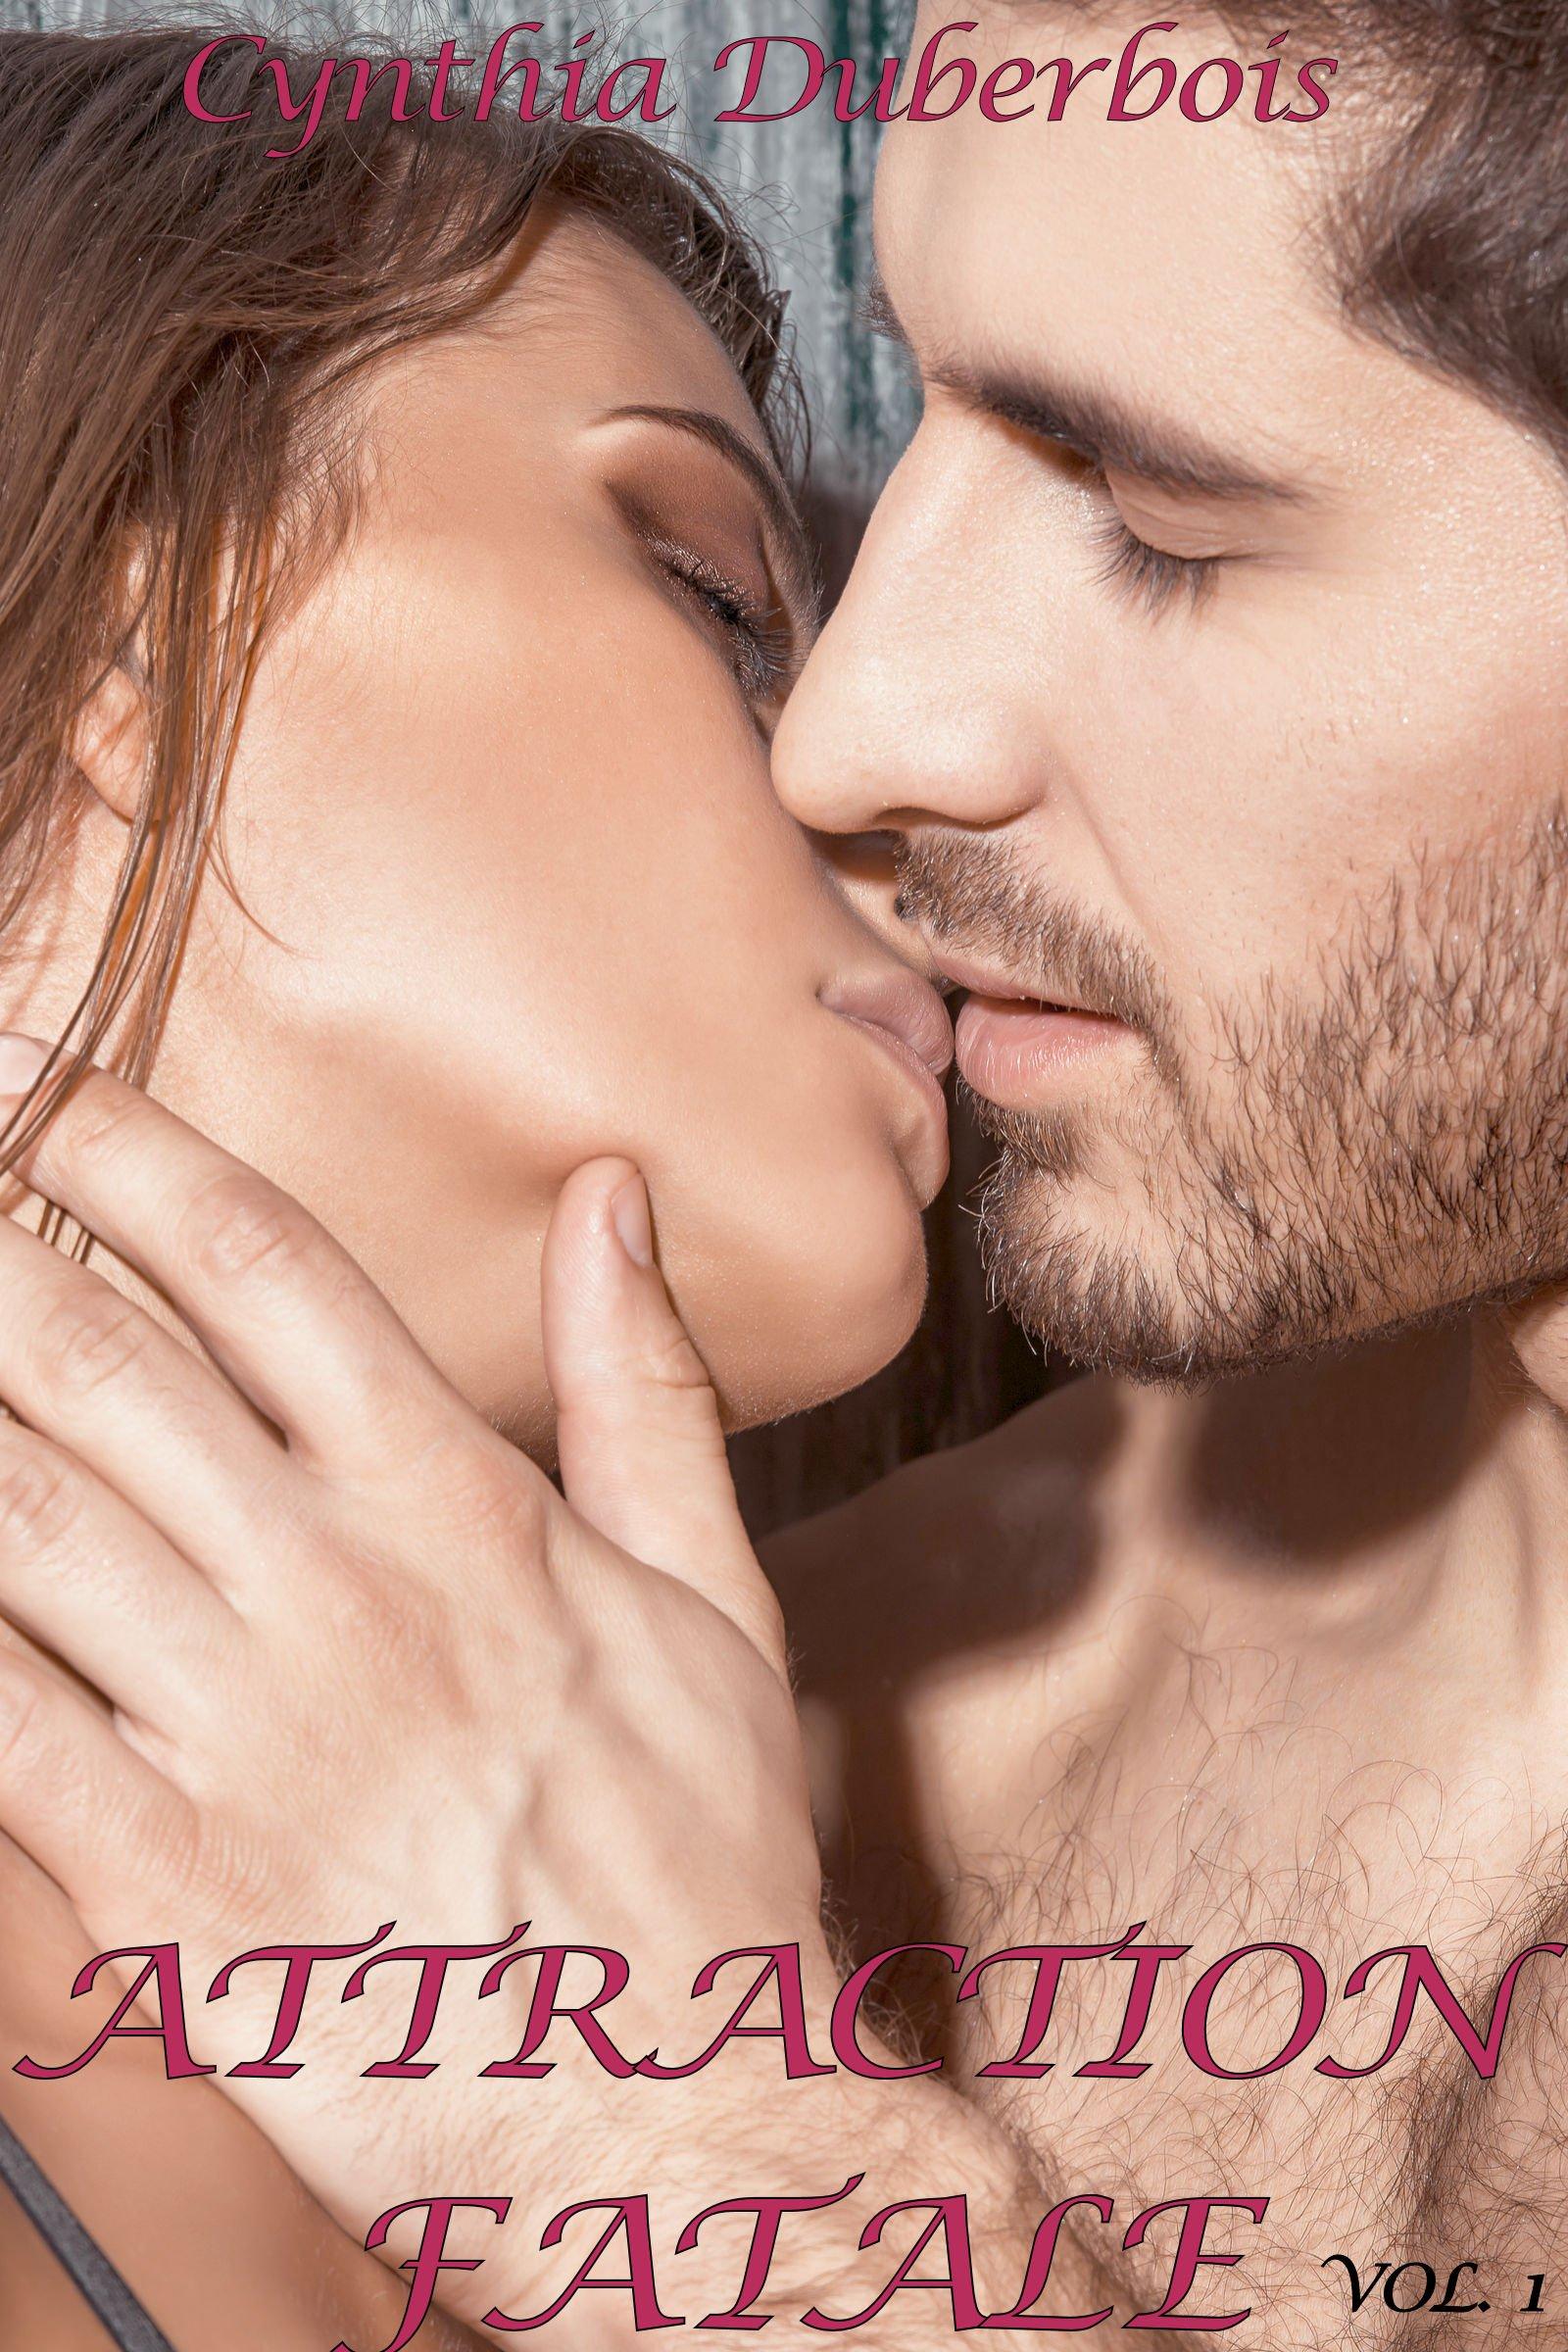 Attraction Fatale: Volume 1 (New Romance, Humour, Erotisme) (Attractions t. 2) por Cynthia Duberbois